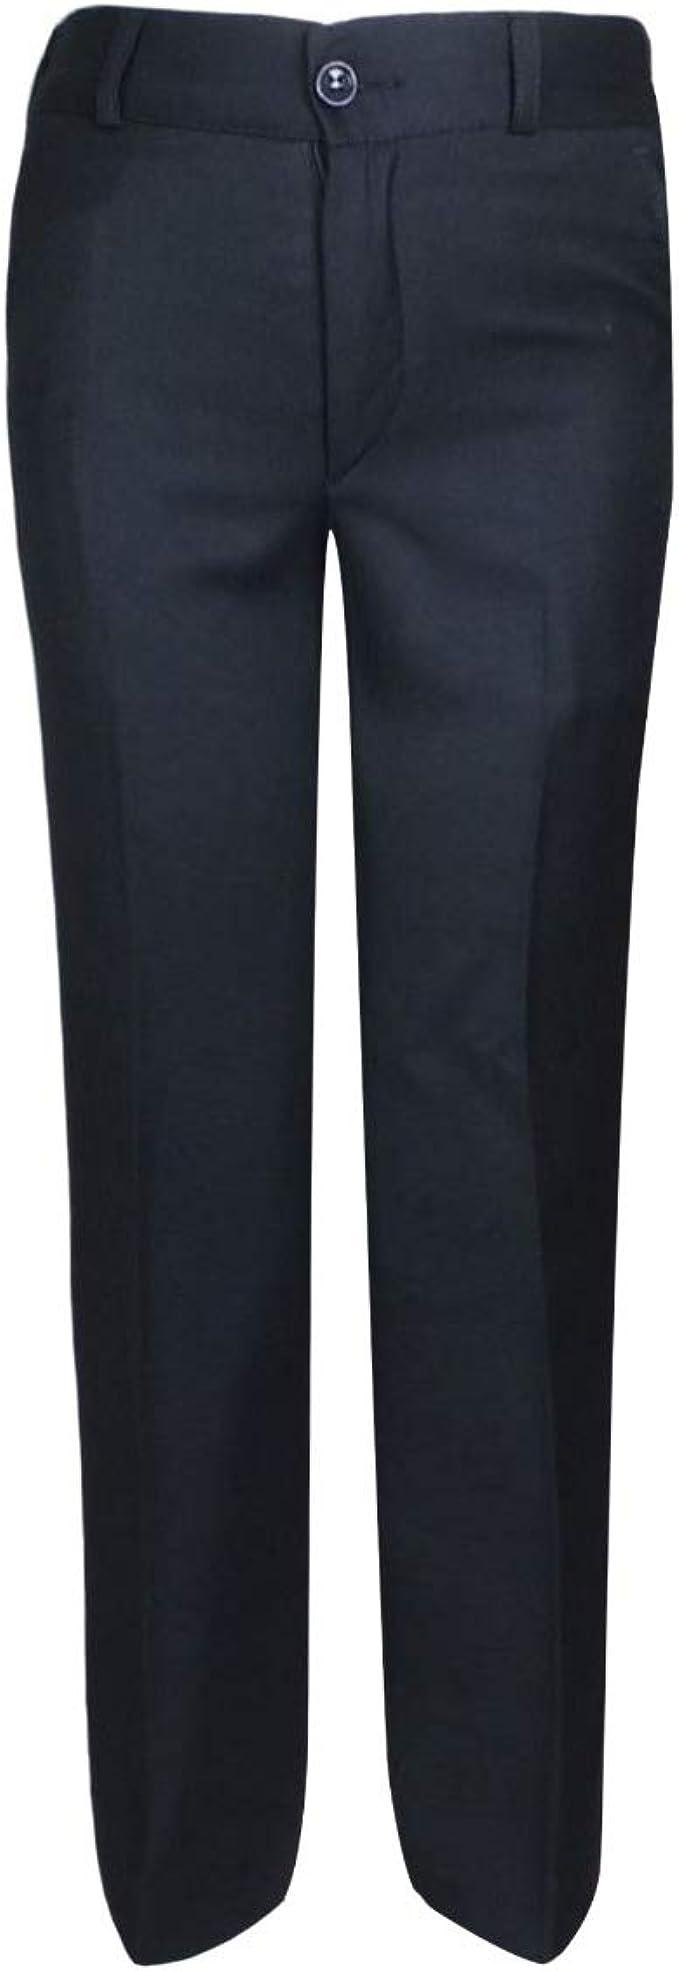 Kilinch Luigi Azul Trajes de Corbata de Boda Formal a Medida de 5 ...